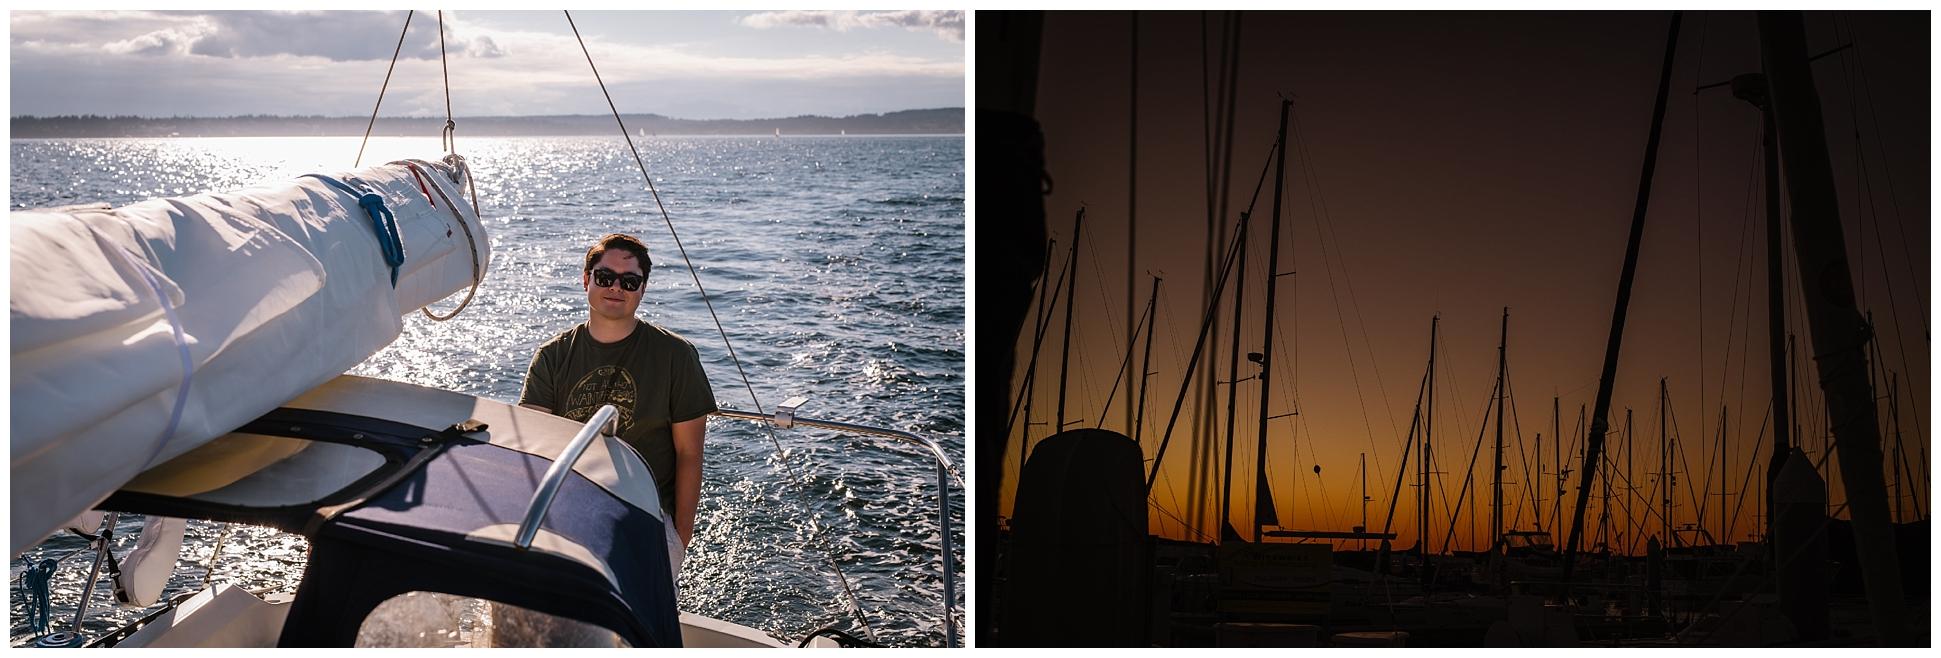 Ashlee-hamon-photography-year-in-review-2016-travel-wanderlust-vsco-adventure-wedding_0108.jpg